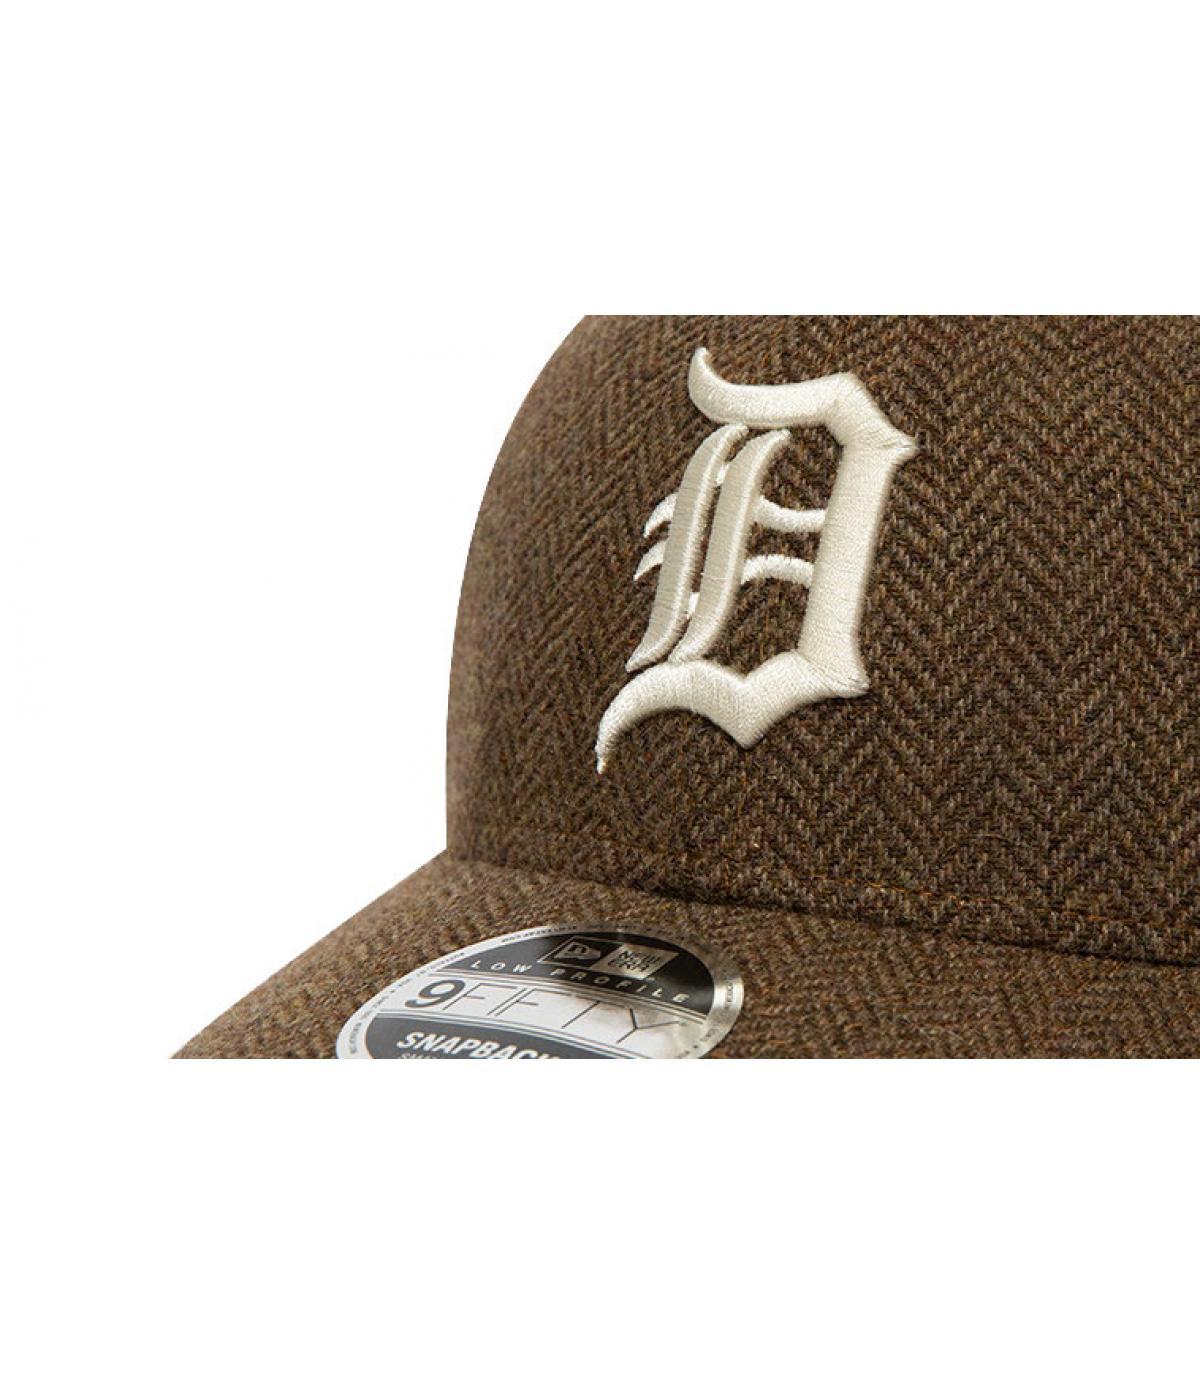 Details Snapback MLB Tweed Detroit 950 old gold - Abbildung 3